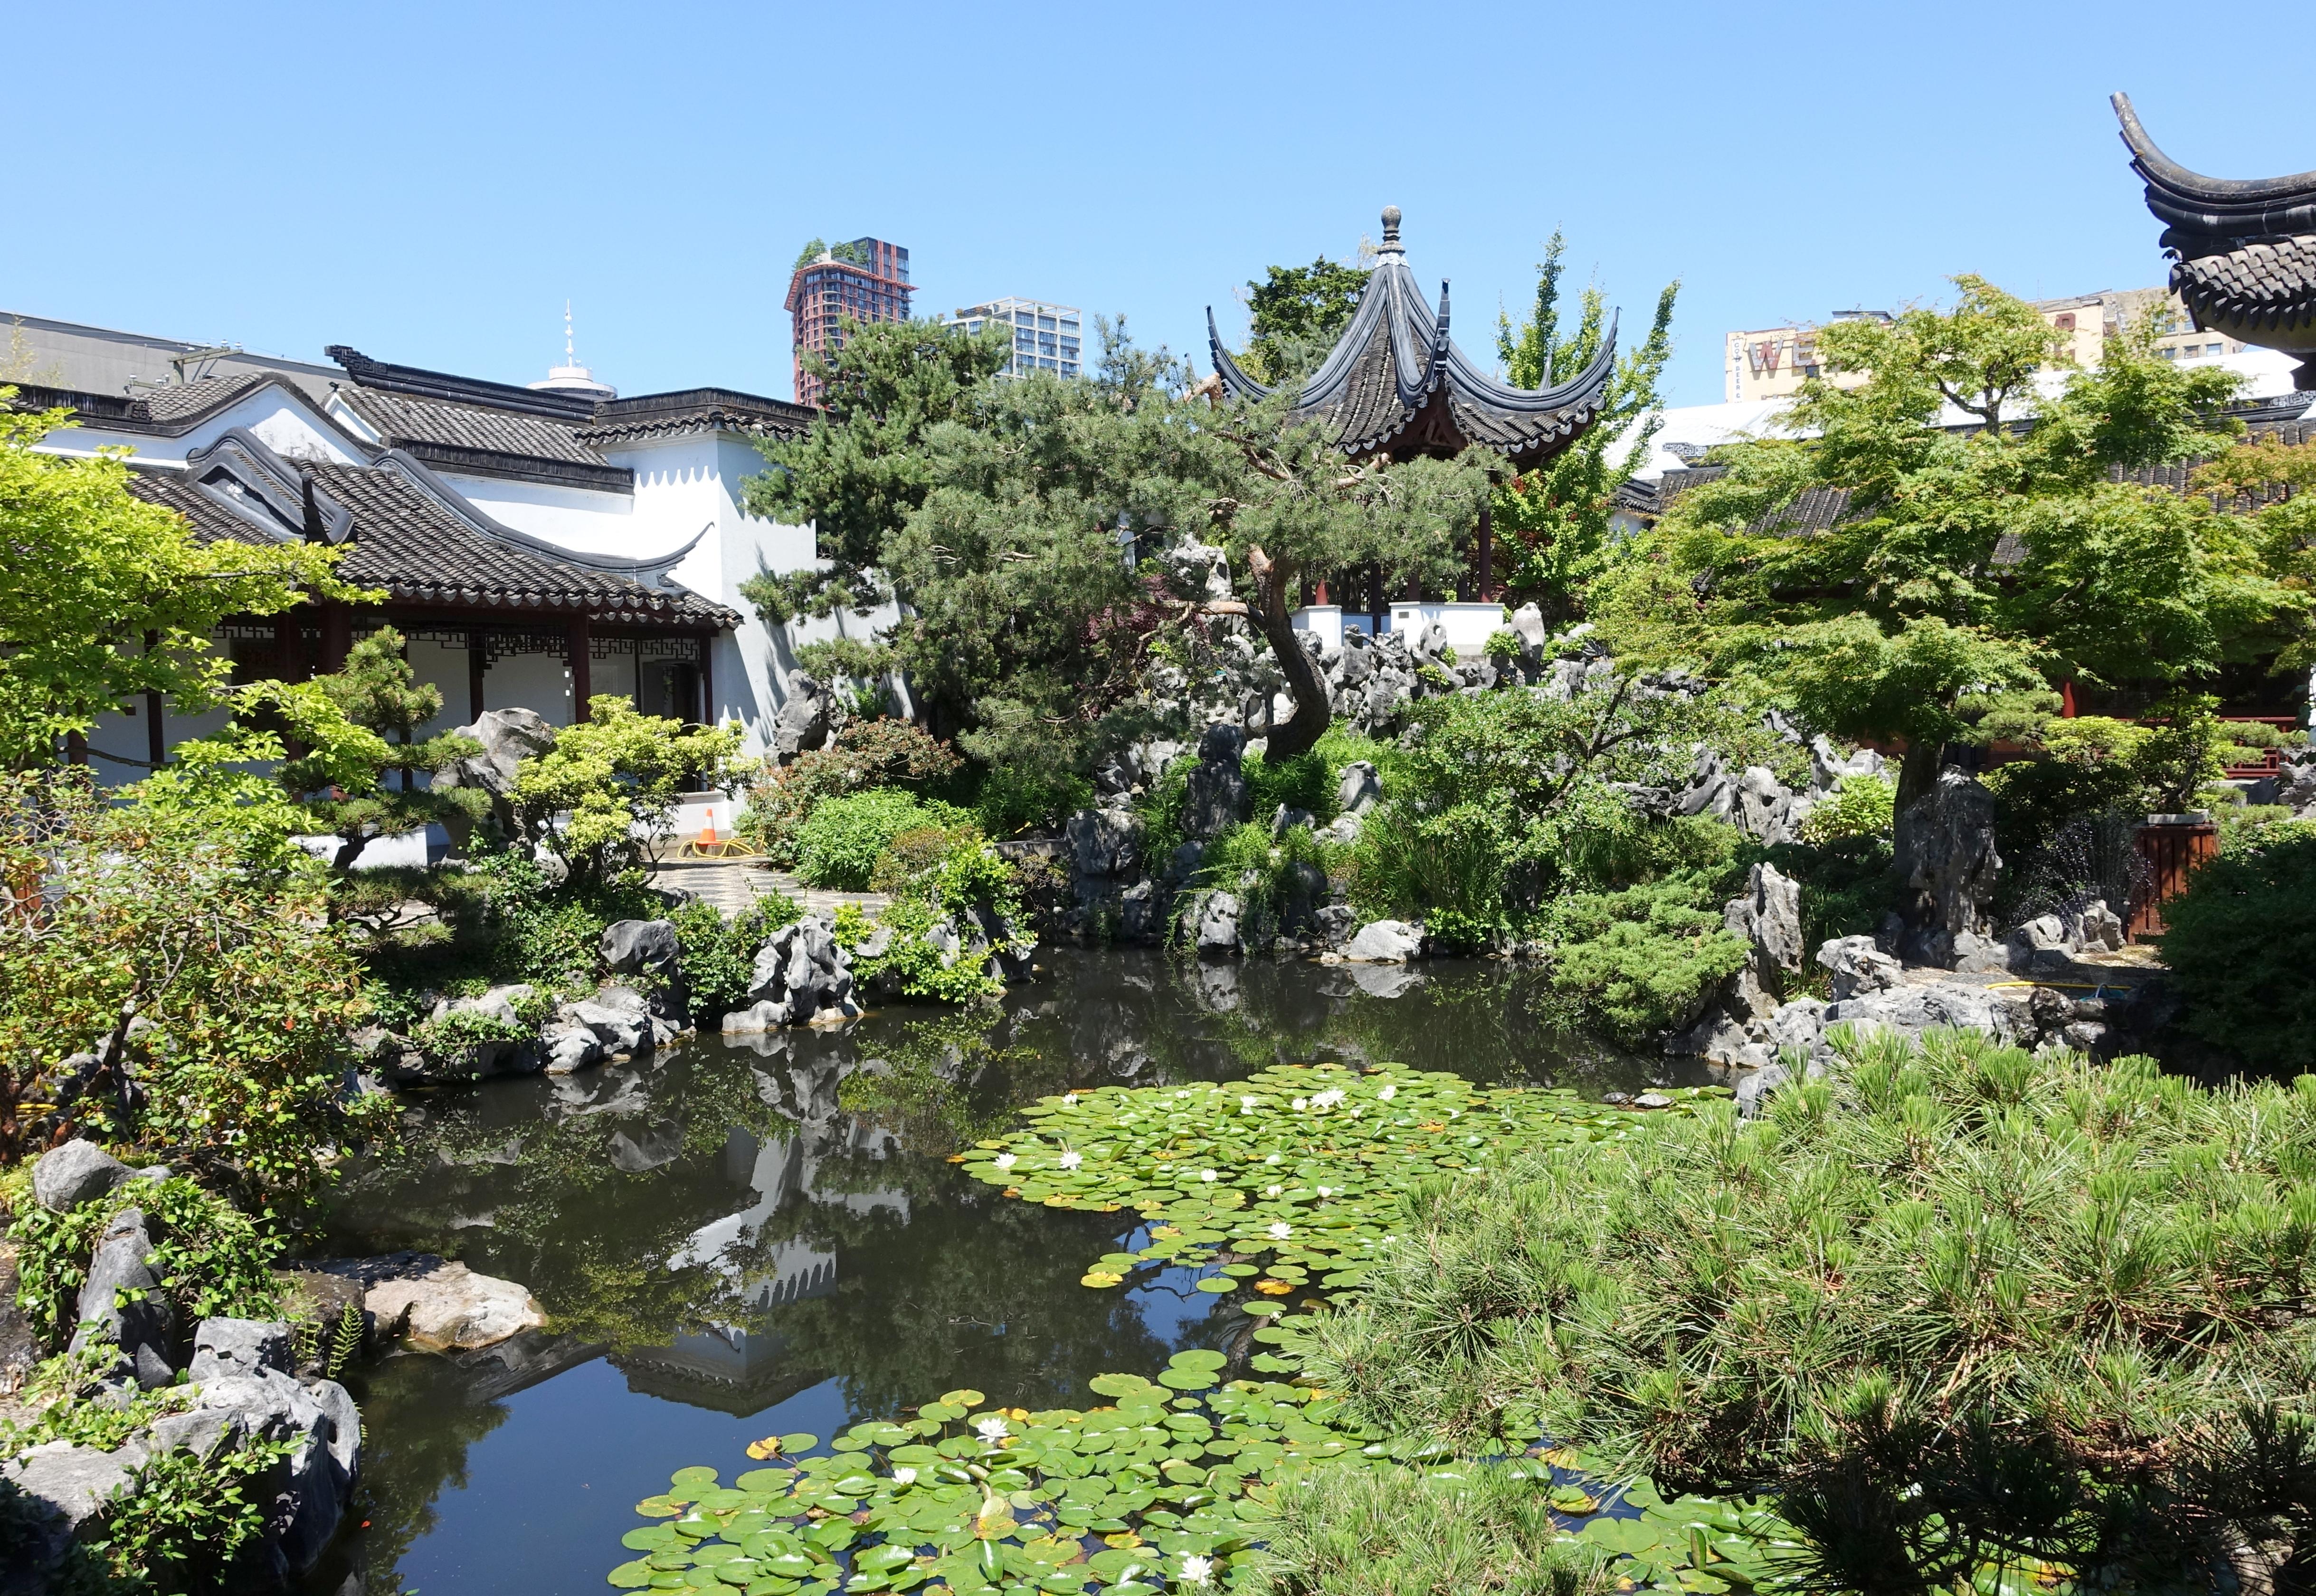 Pond - Dr. Sun Yat-Sen Classical Chinese Garden - Vancouver, Canada - DSC09838.JPG